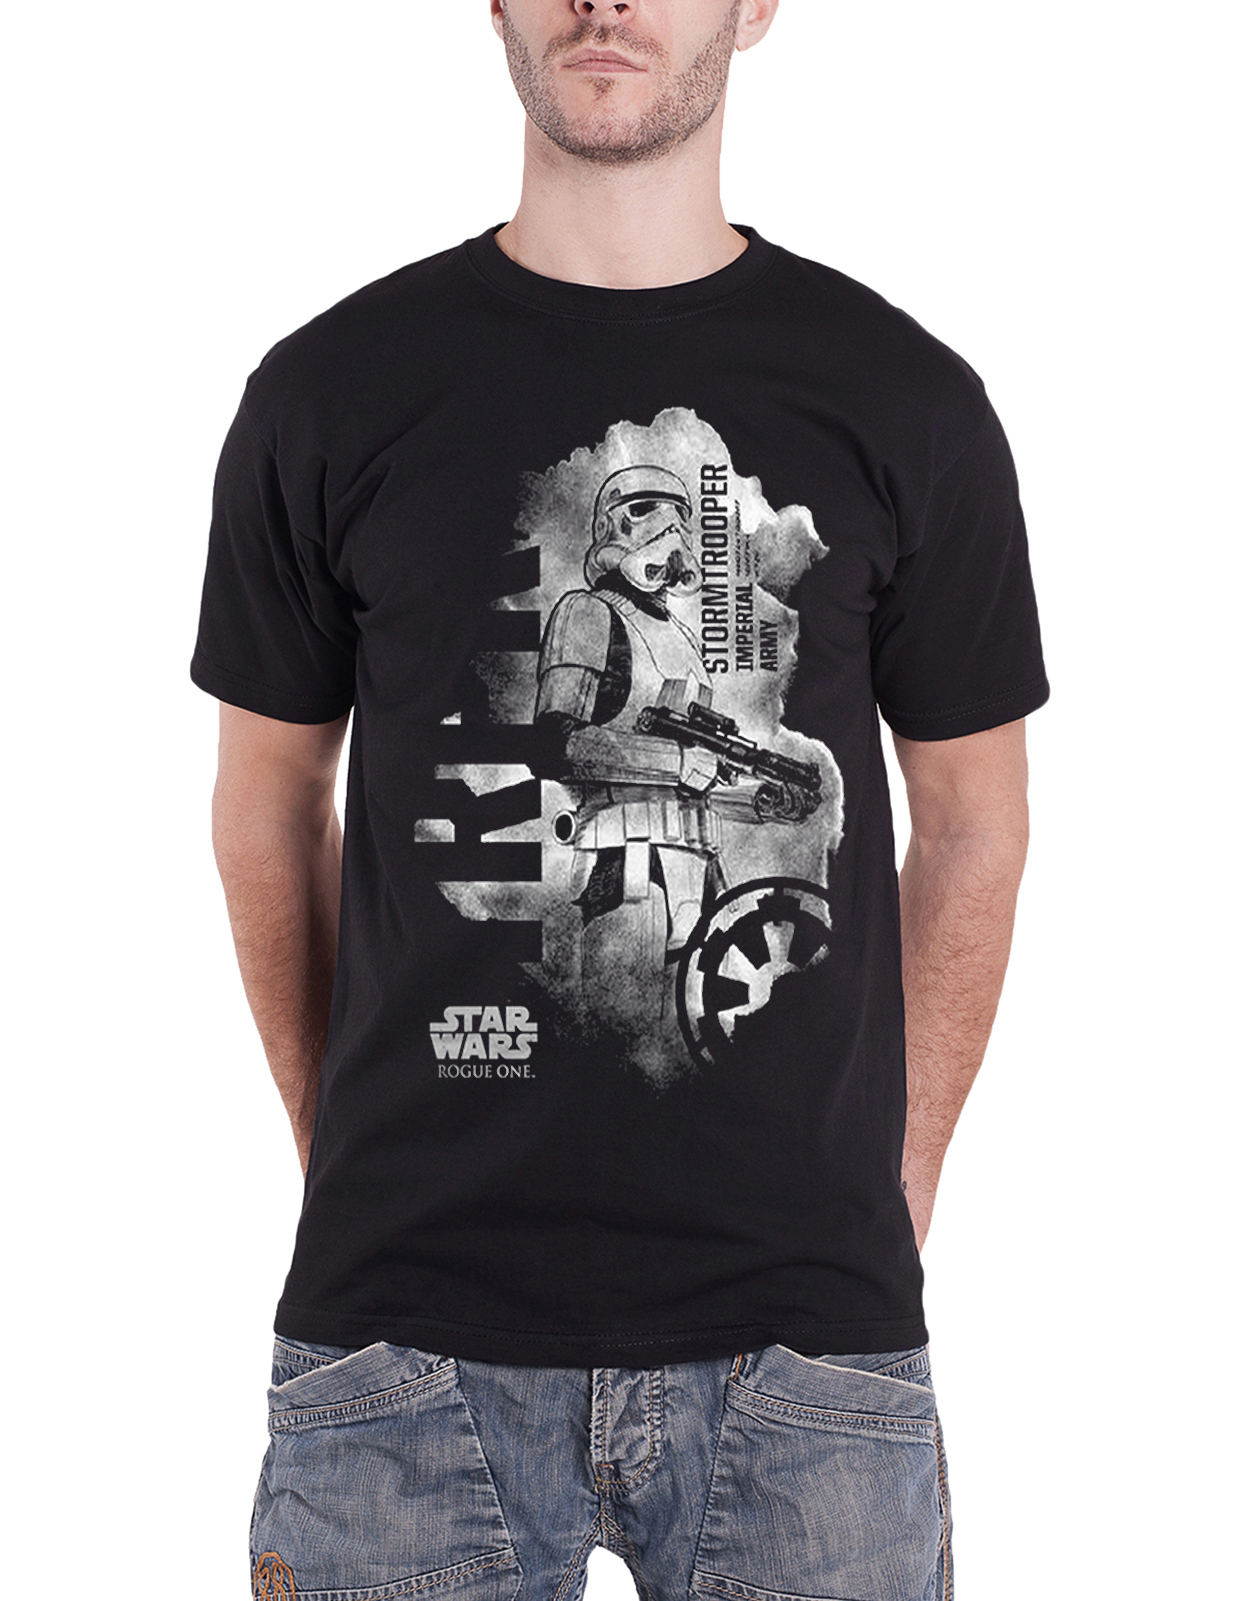 Star Wars Rogue One 1 T Shirt Death Trooper K 2so At At